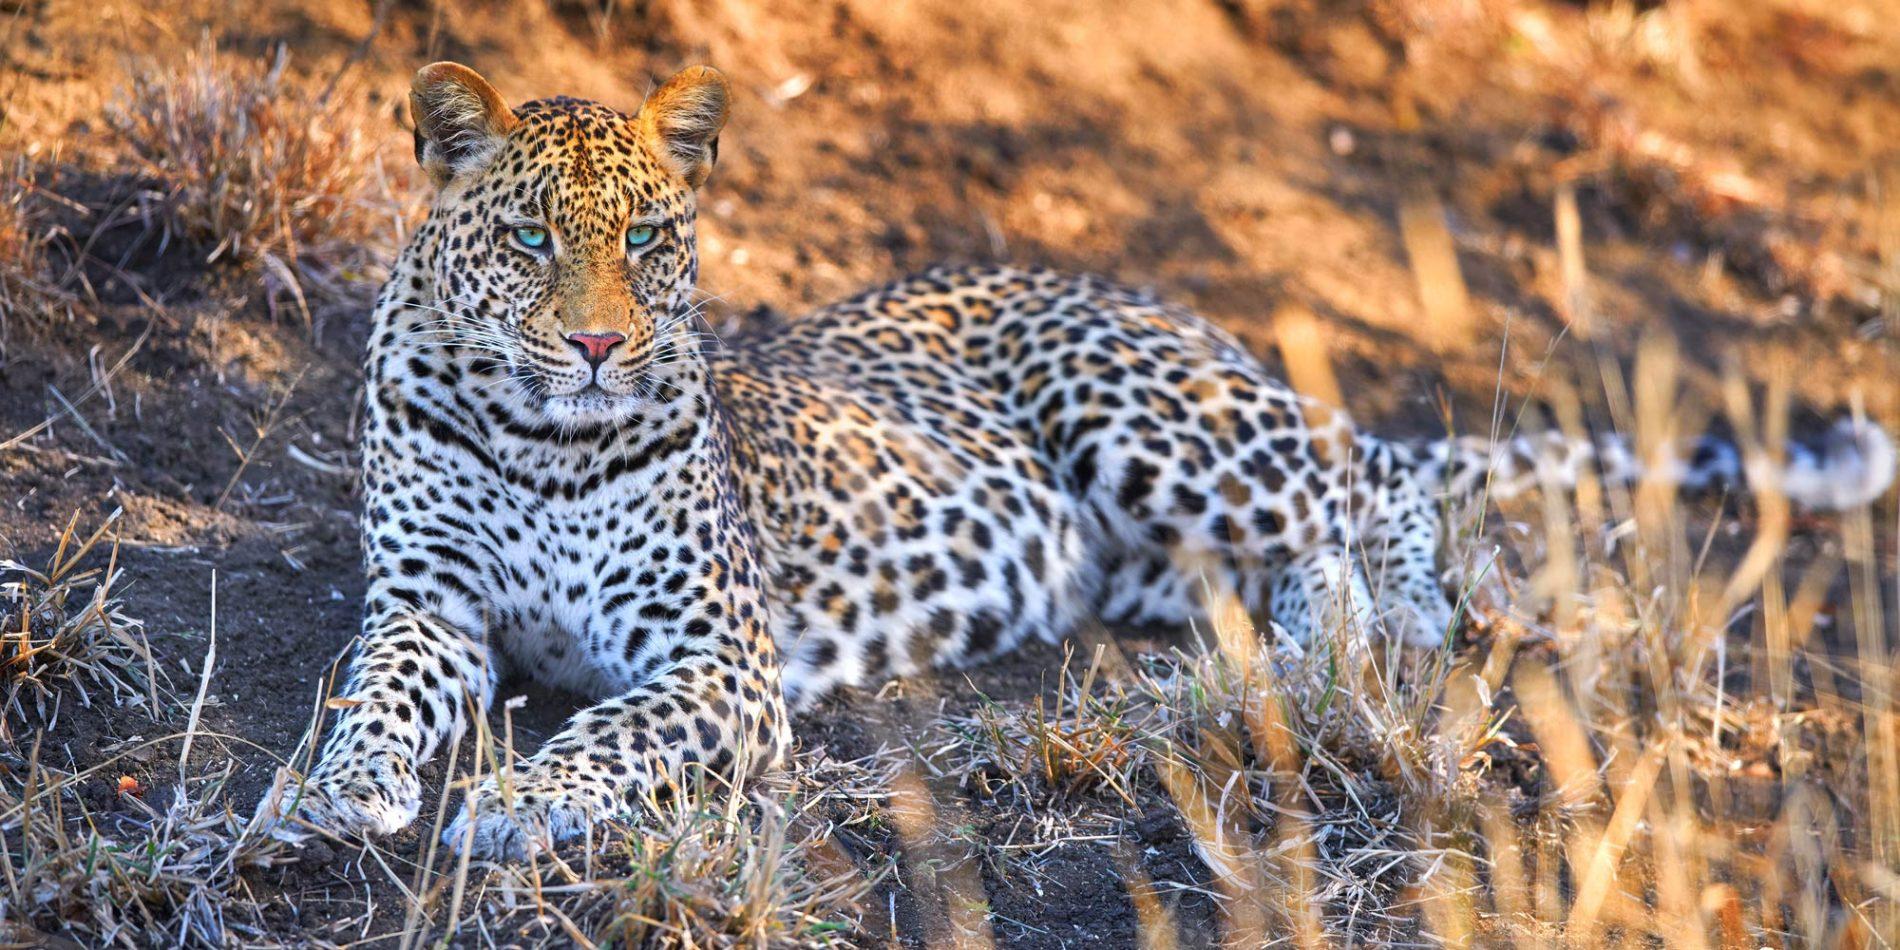 A blue eyed leopard